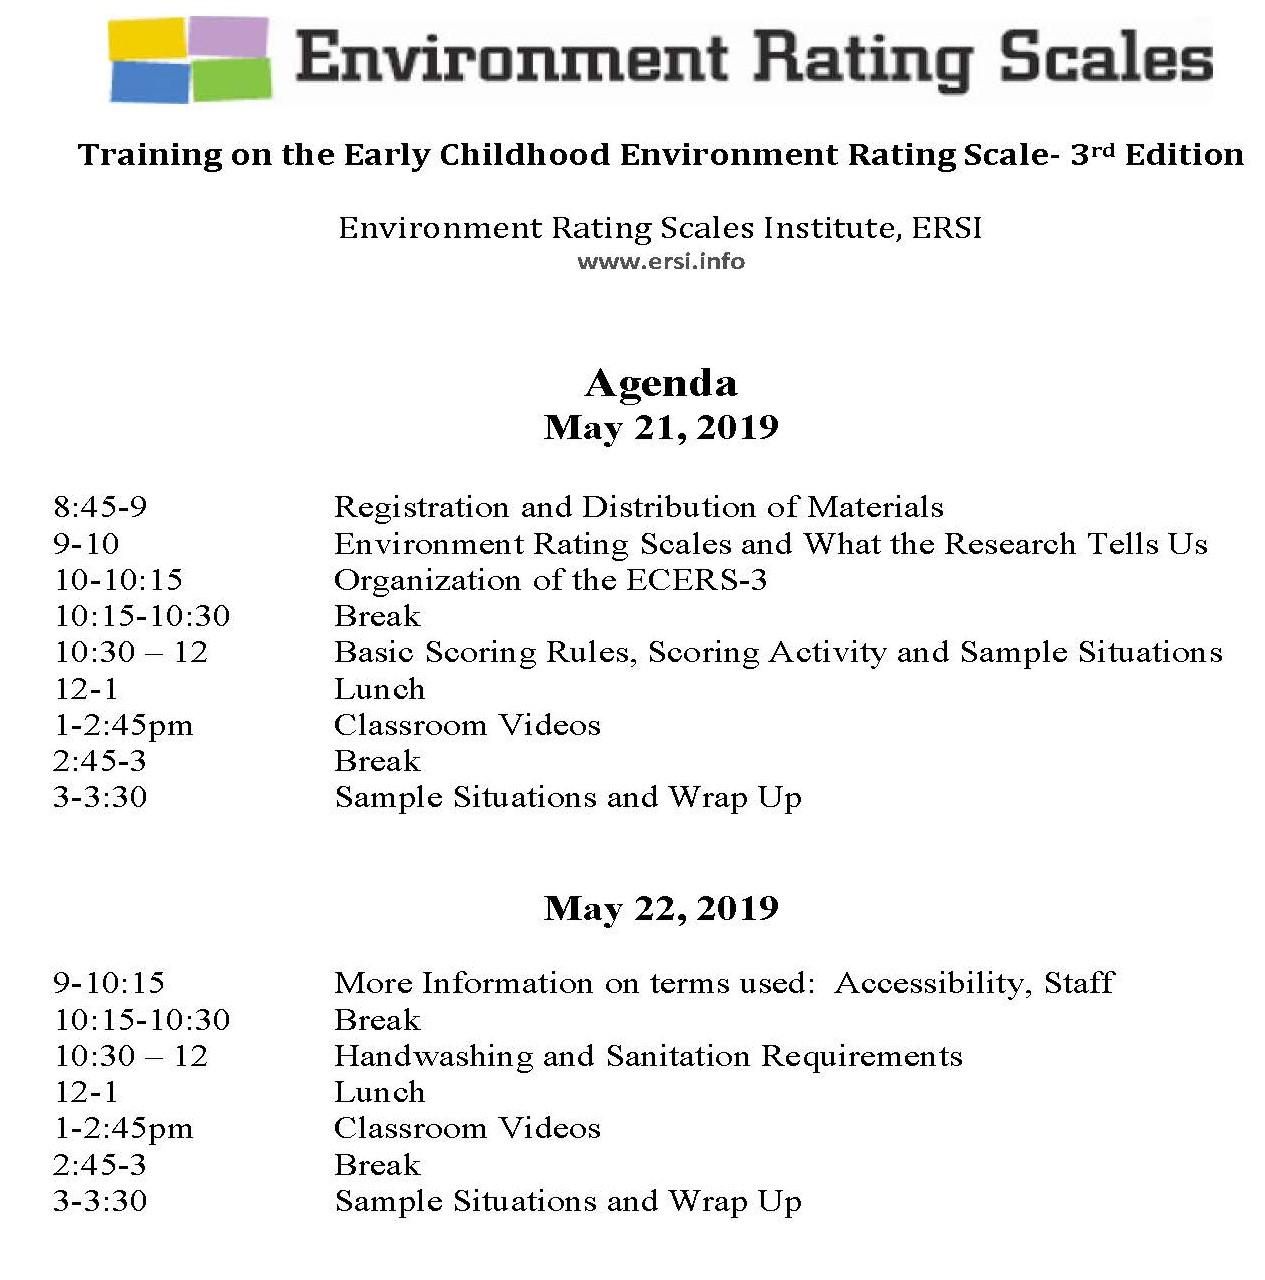 ECERS-3 Agenda